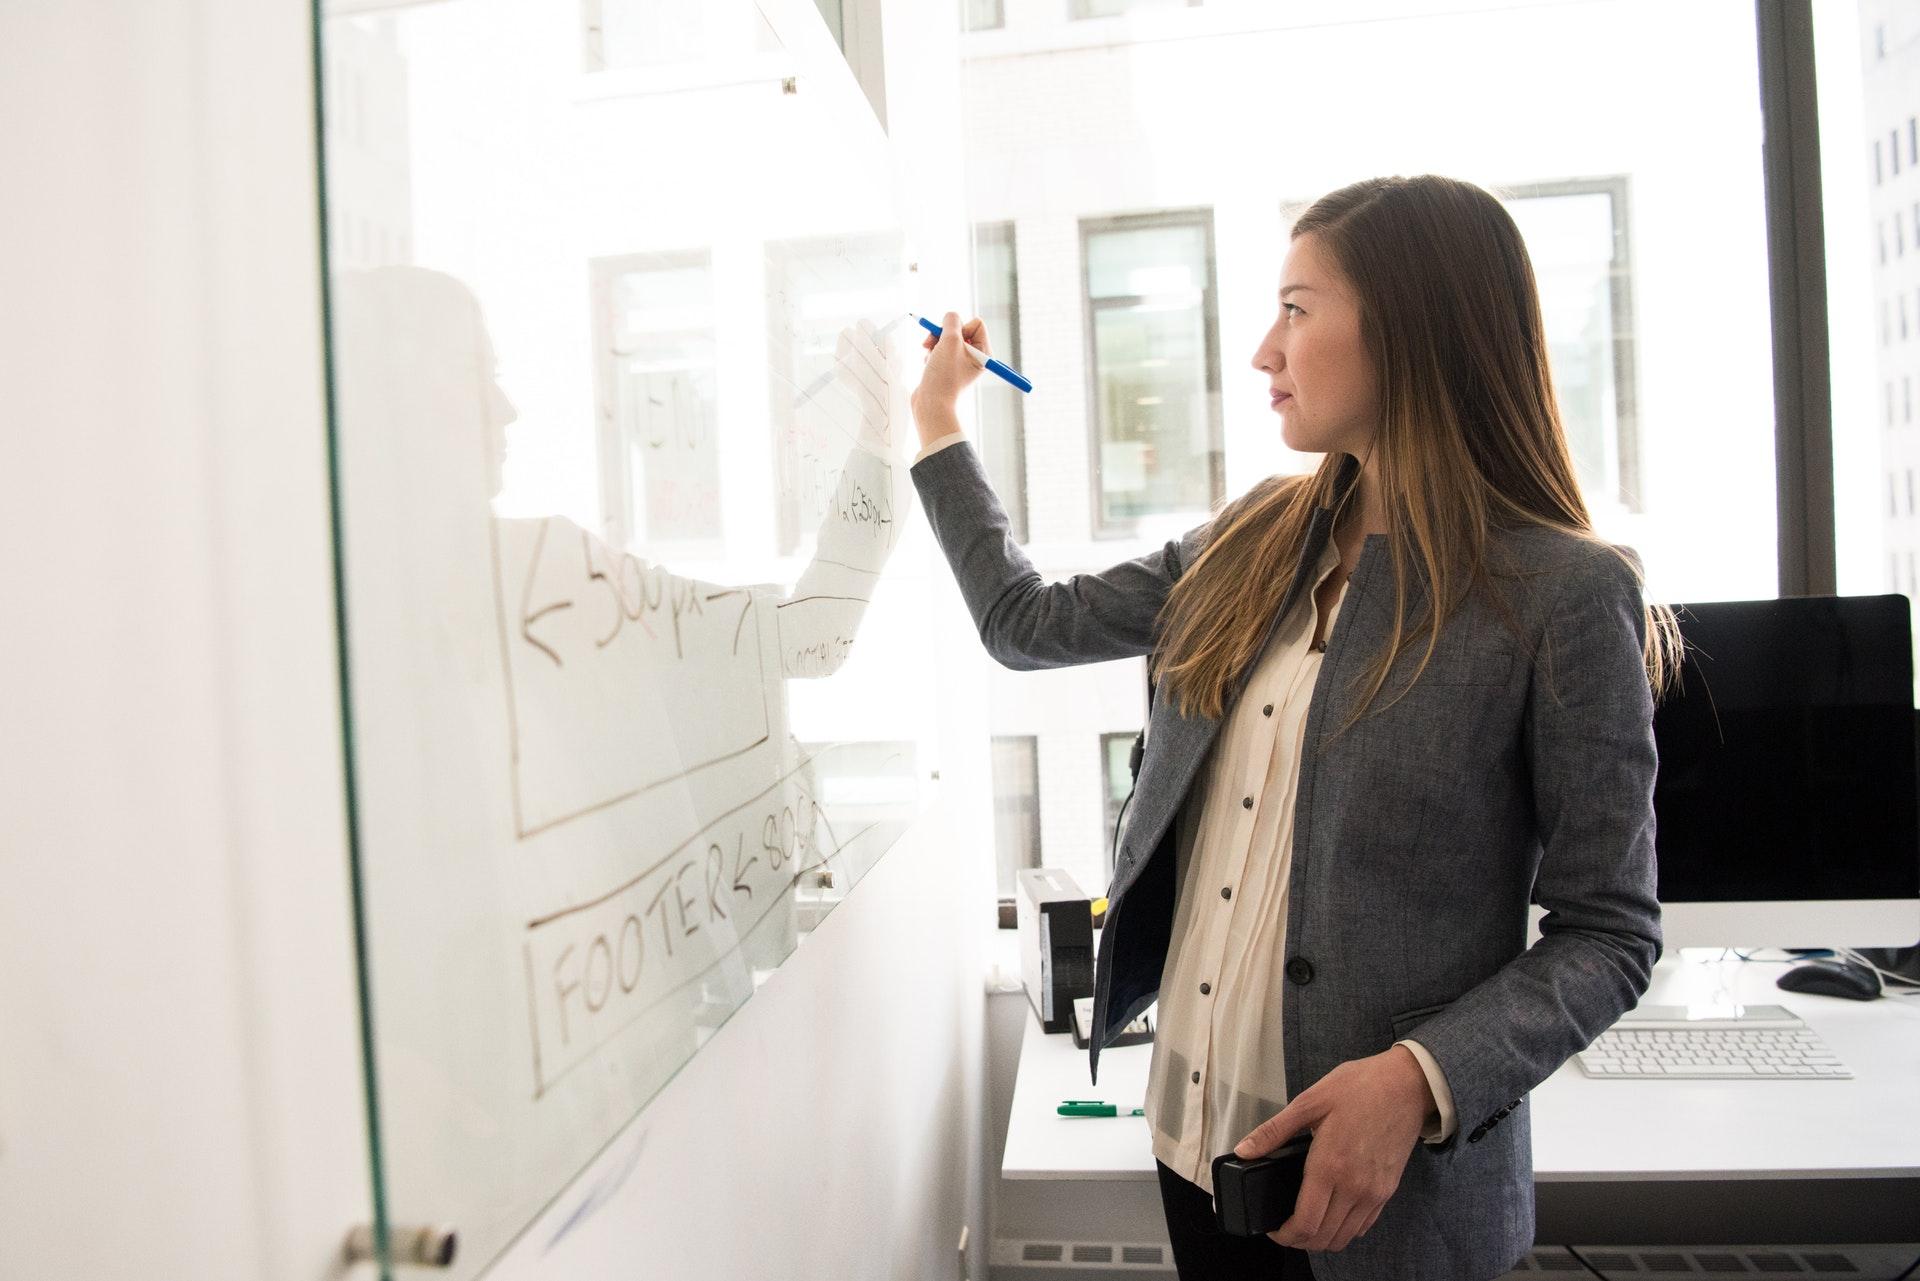 woman-wearing-gray-blazer-writing-on-dry-erase-board-1181534